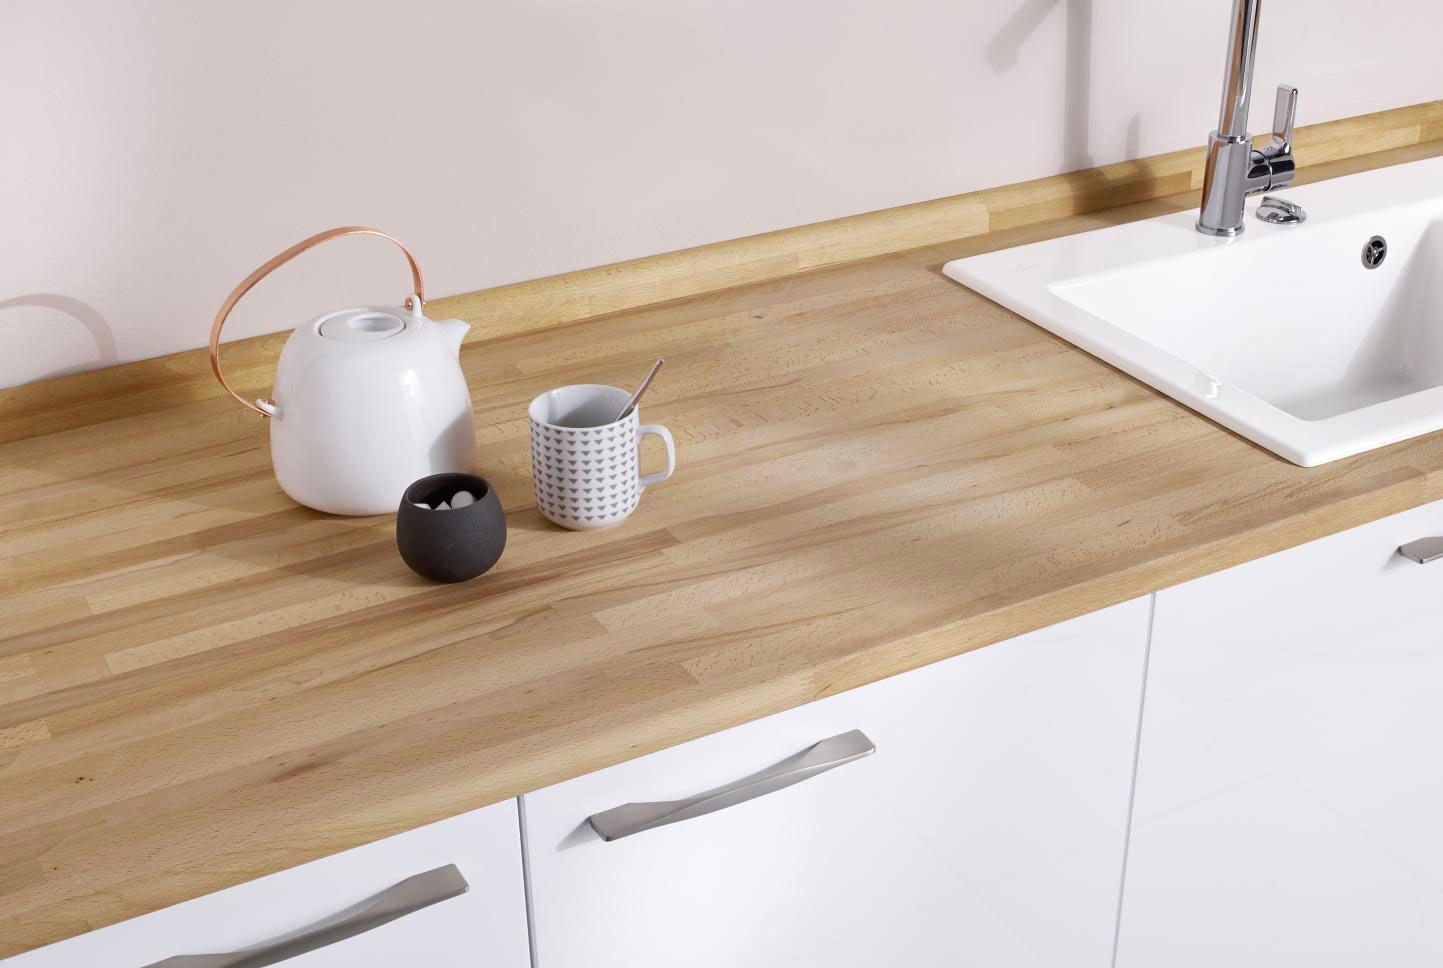 plan de travail cuisine adhesif. Black Bedroom Furniture Sets. Home Design Ideas